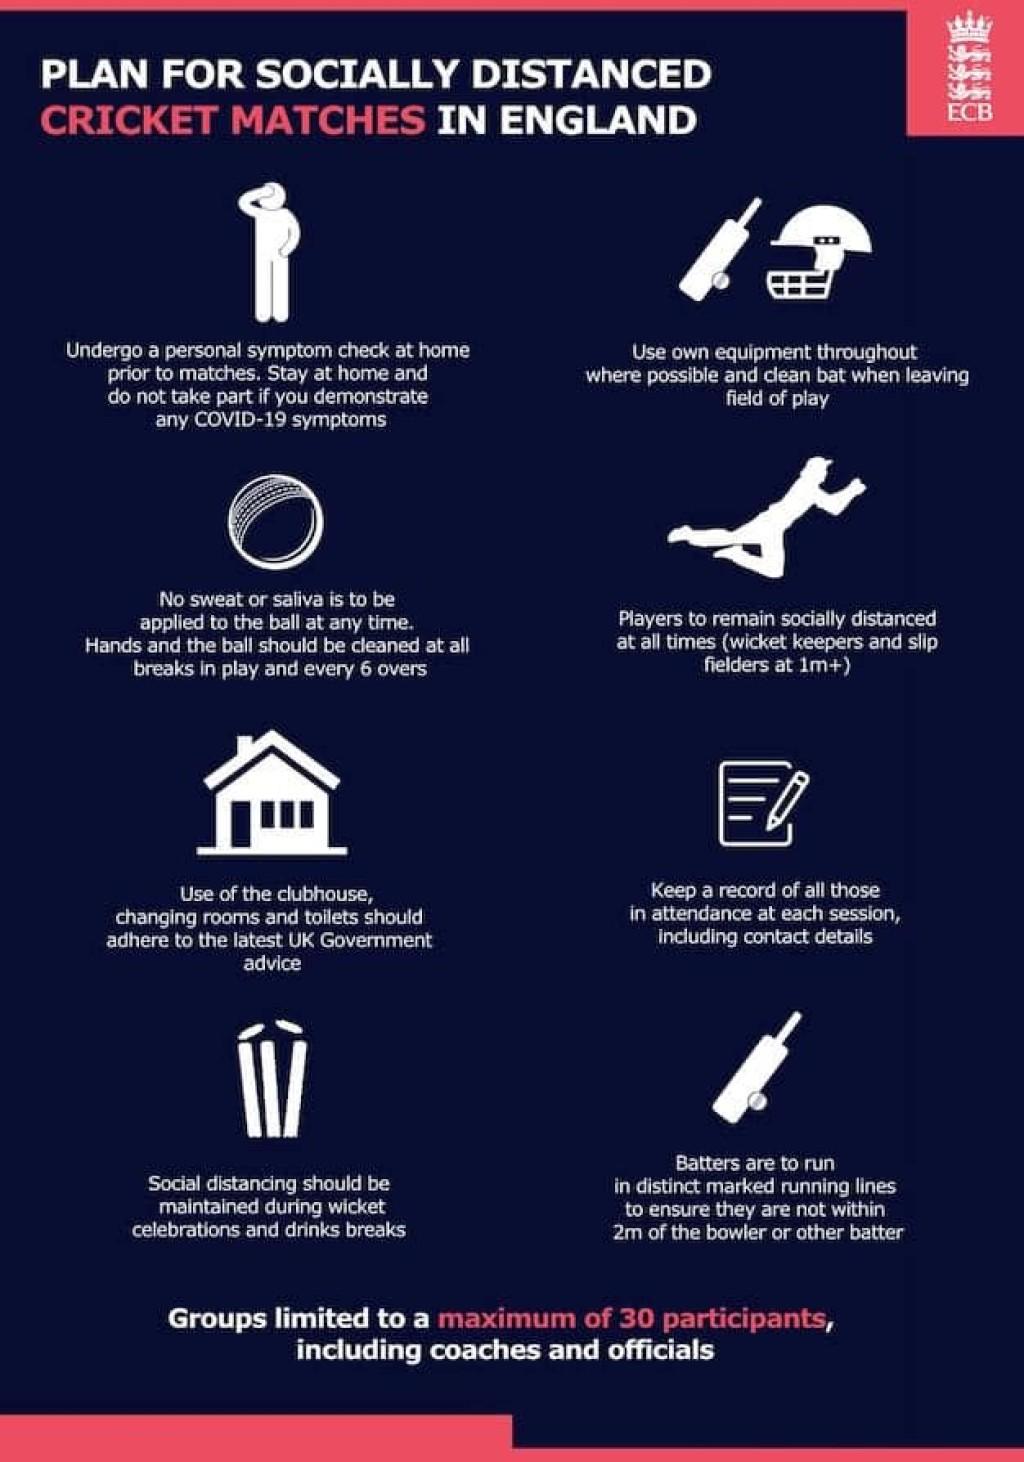 ECB Return To Cricket Guidance